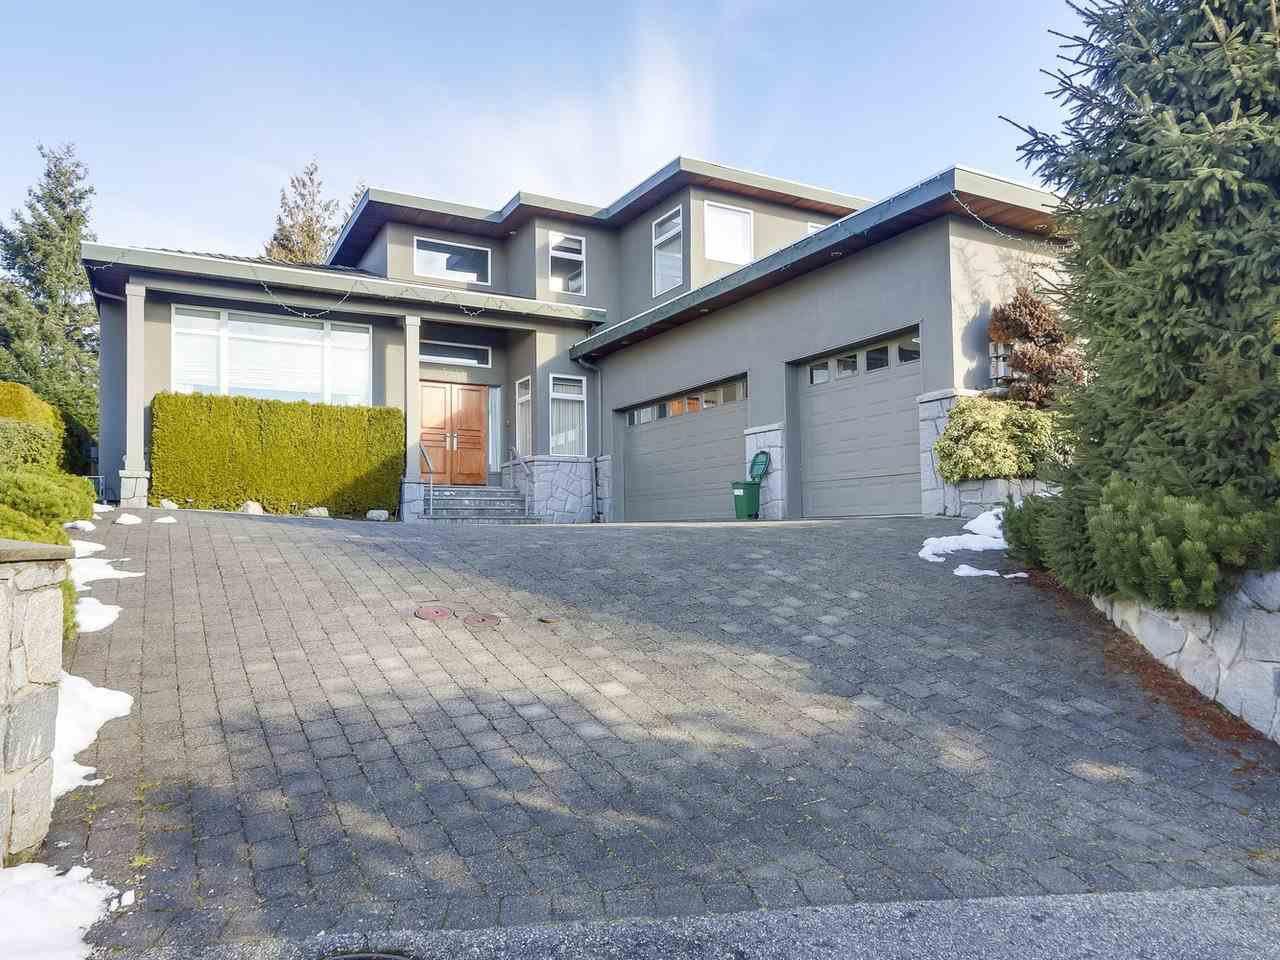 Photo 1: Photos: 5441 WEST VISTA COURT in West Vancouver: Upper Caulfeild House for sale : MLS®# R2341877